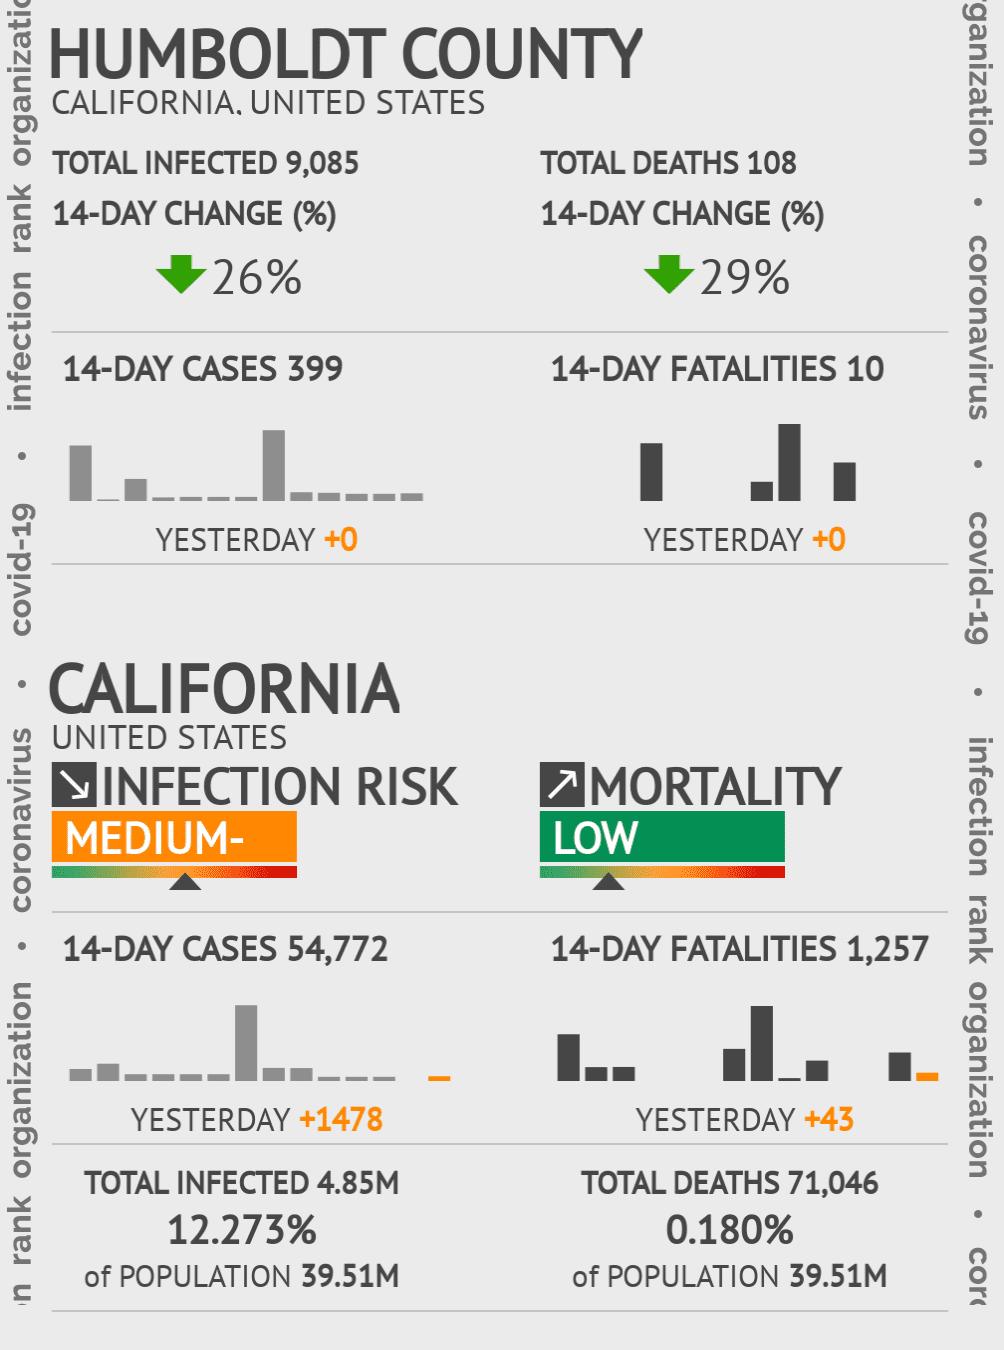 Humboldt County Coronavirus Covid-19 Risk of Infection on November 23, 2020